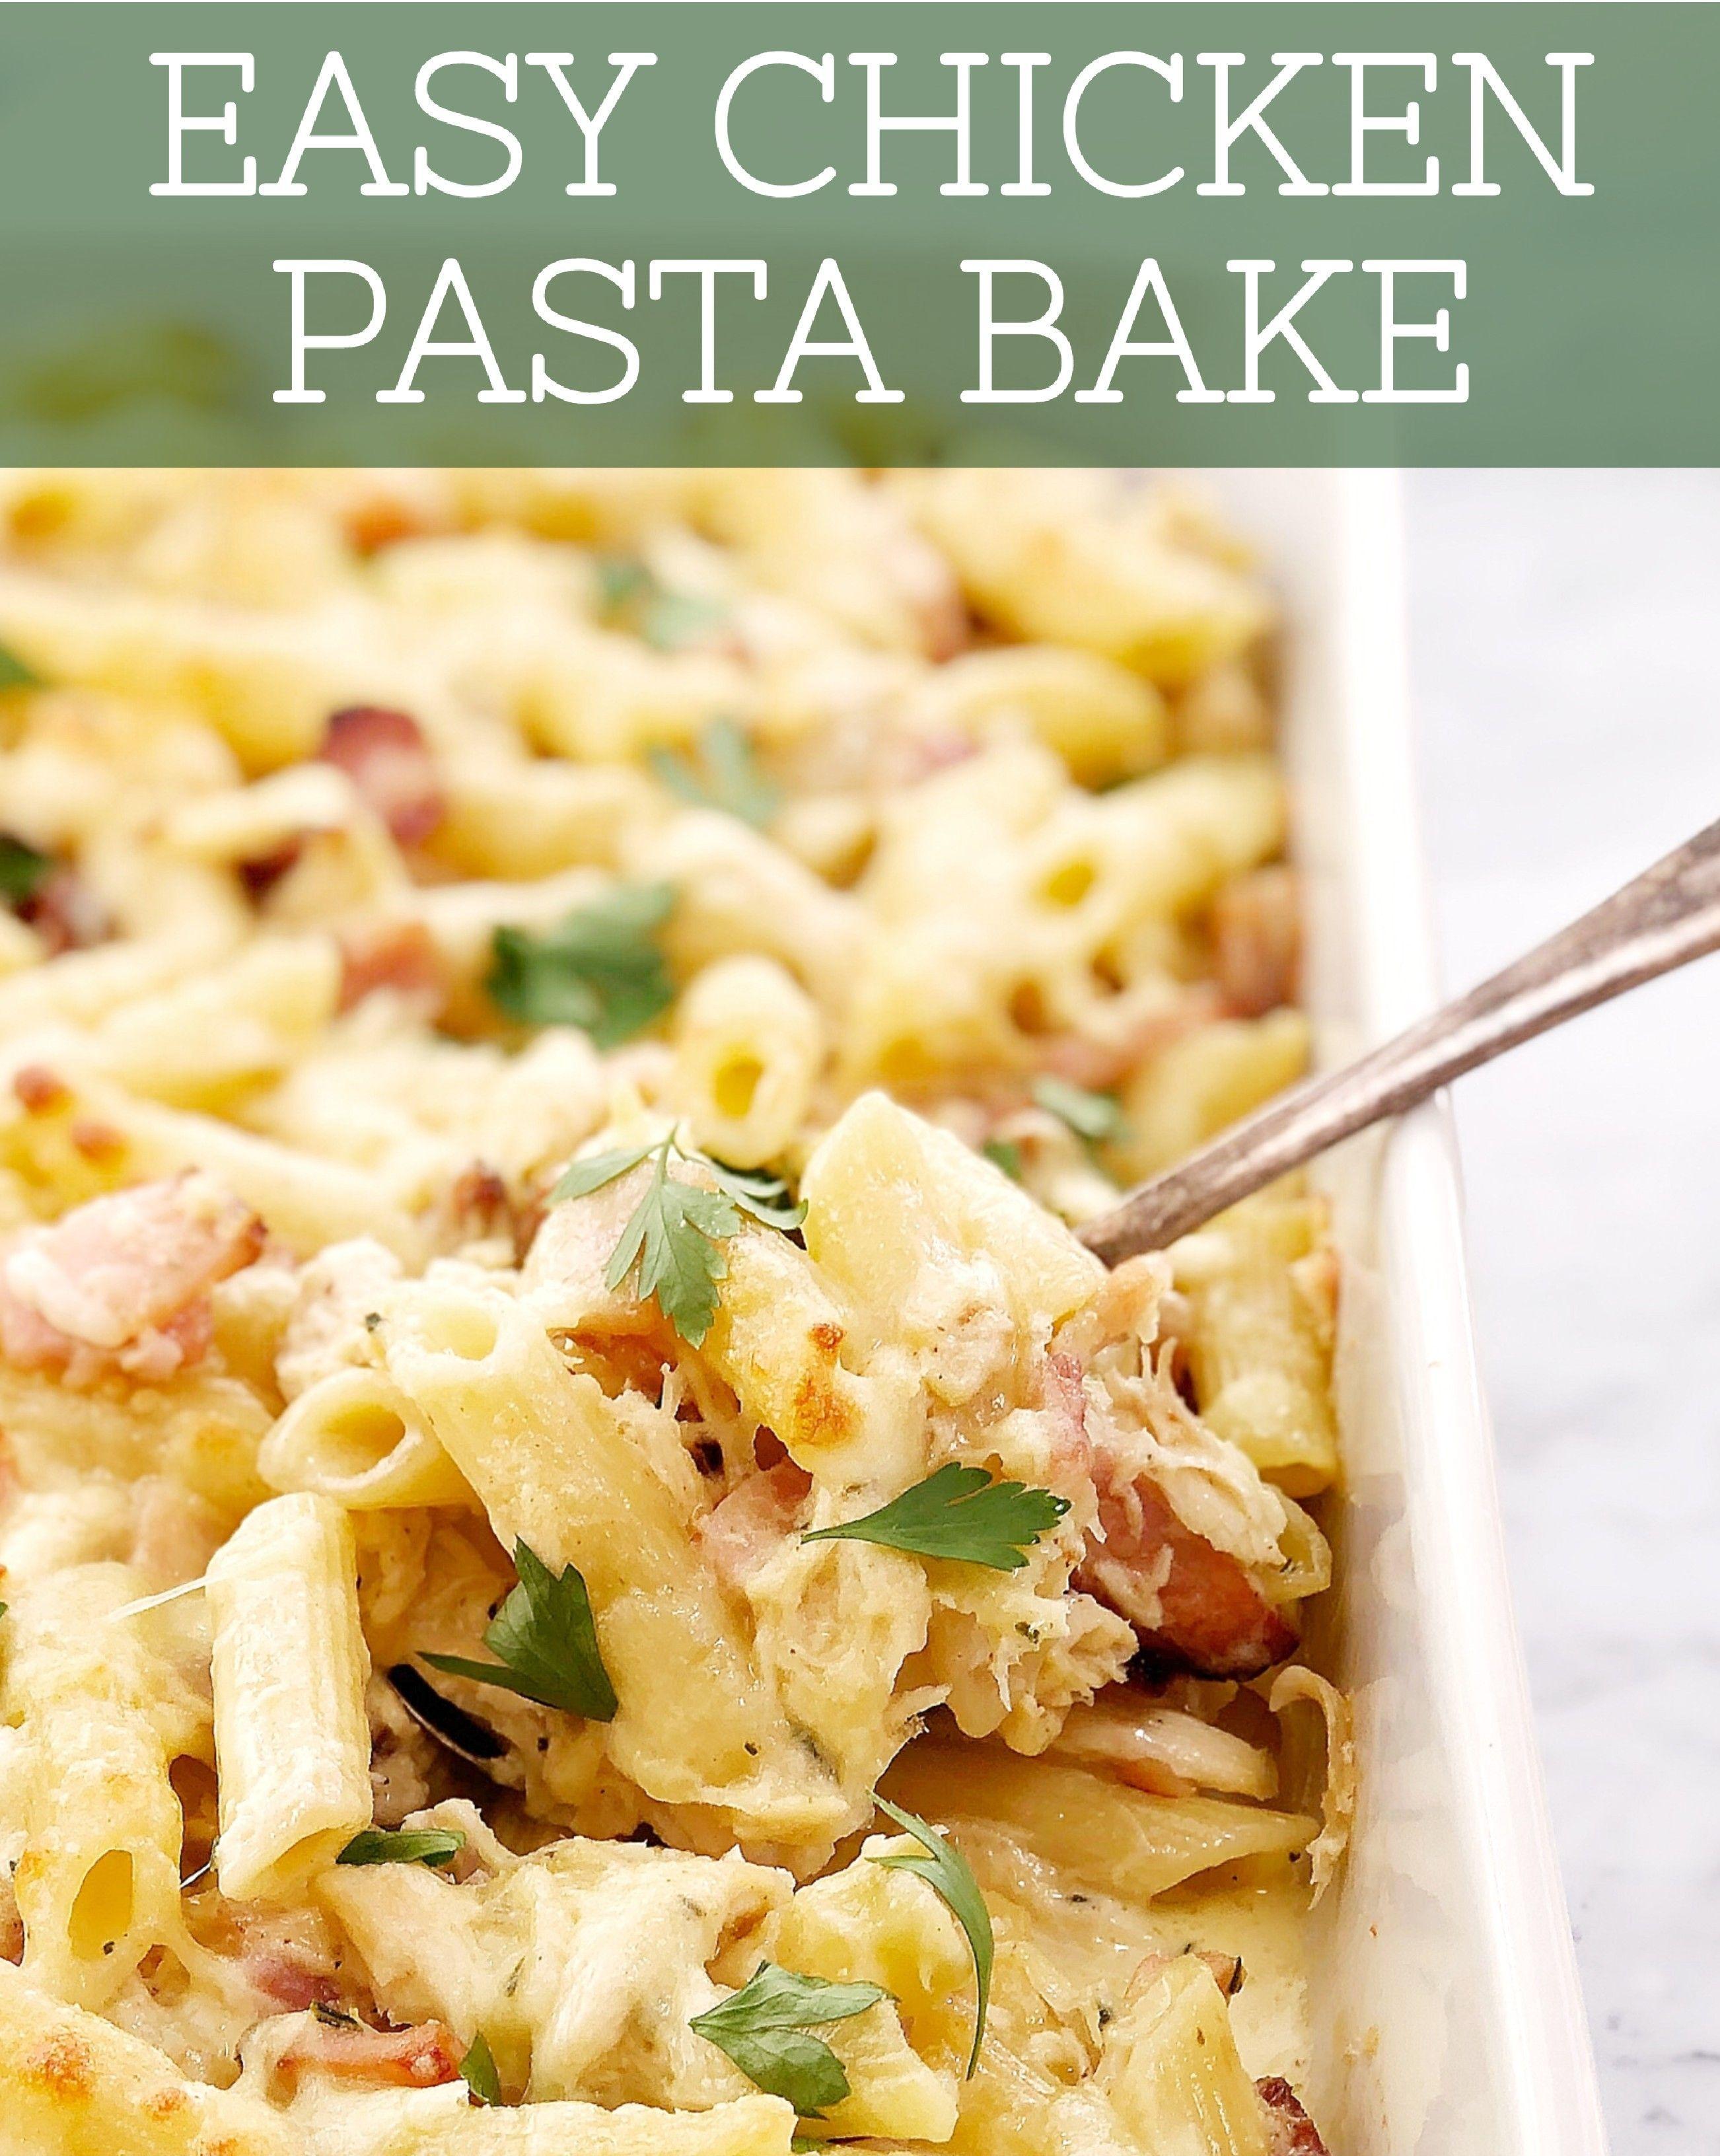 Easy Creamy Chicken Pasta Bake Chef Not Required Recipe Chicken Pasta Bake Easy Pasta Recipes Creamy Chicken Pasta Bake